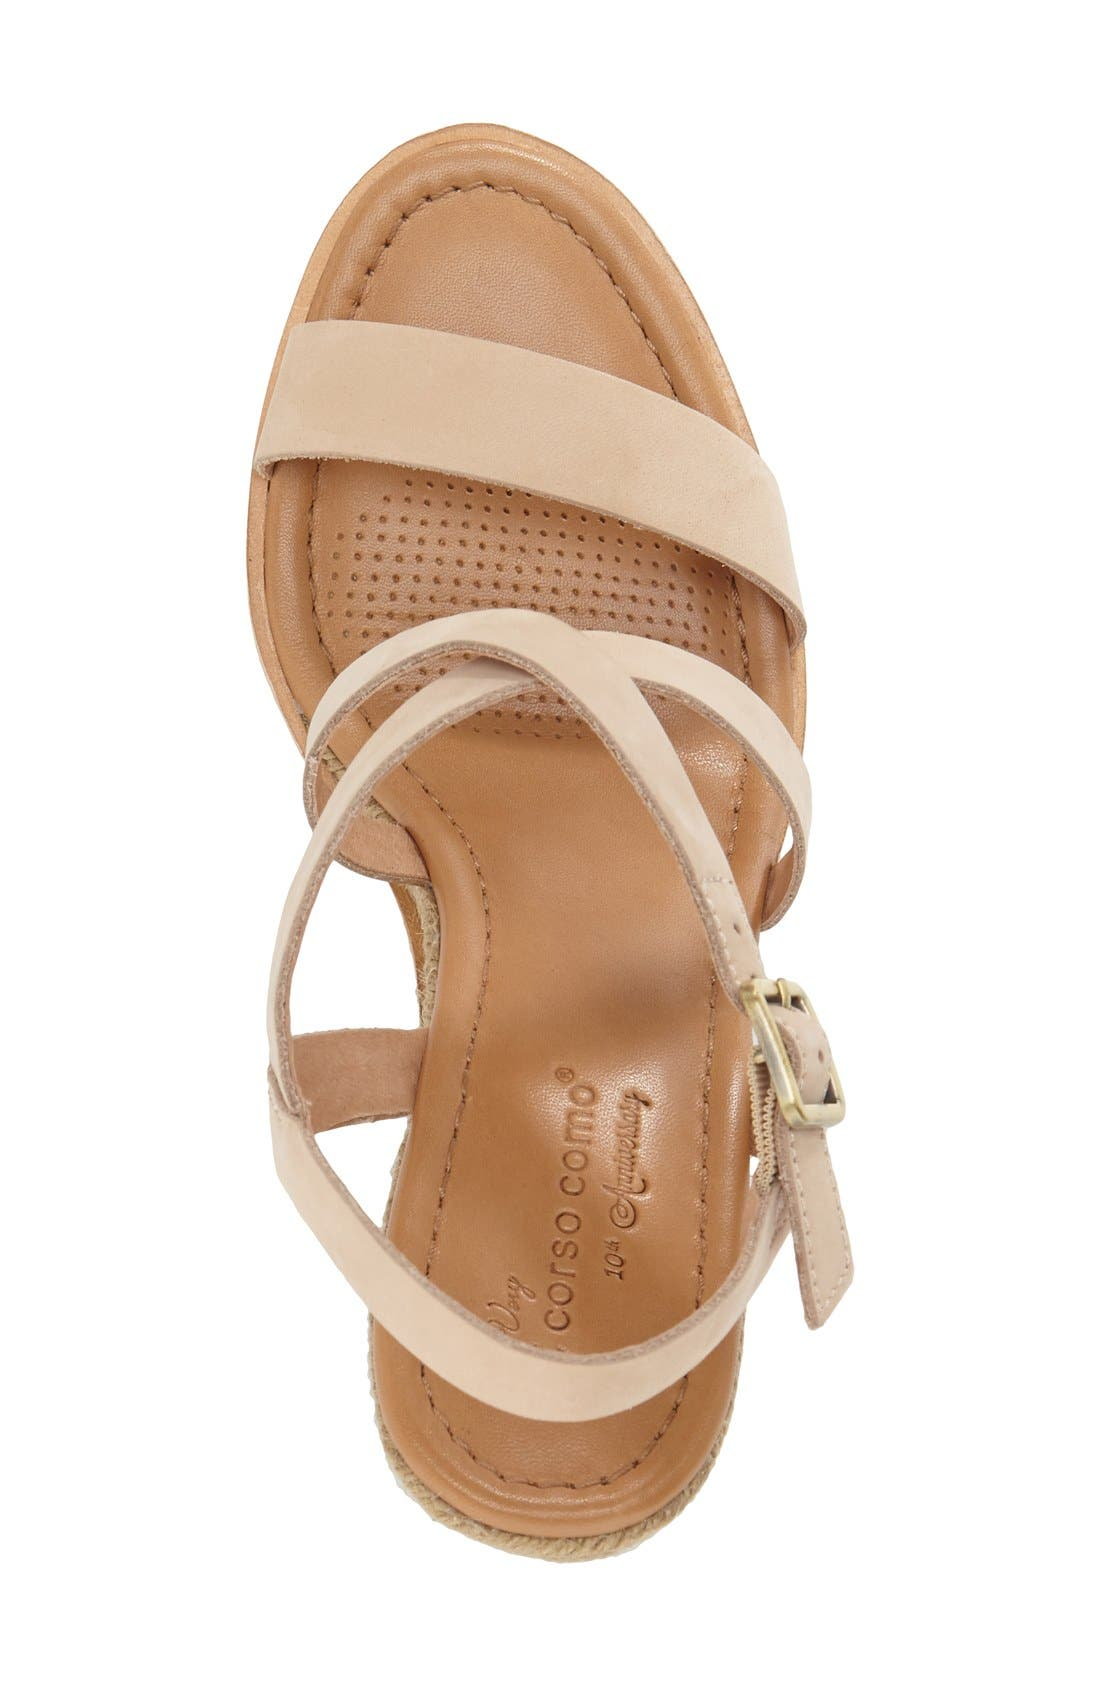 Alternate Image 3  - Corso Como 'Gladis' Espadrille Wedge Sandal (Women)